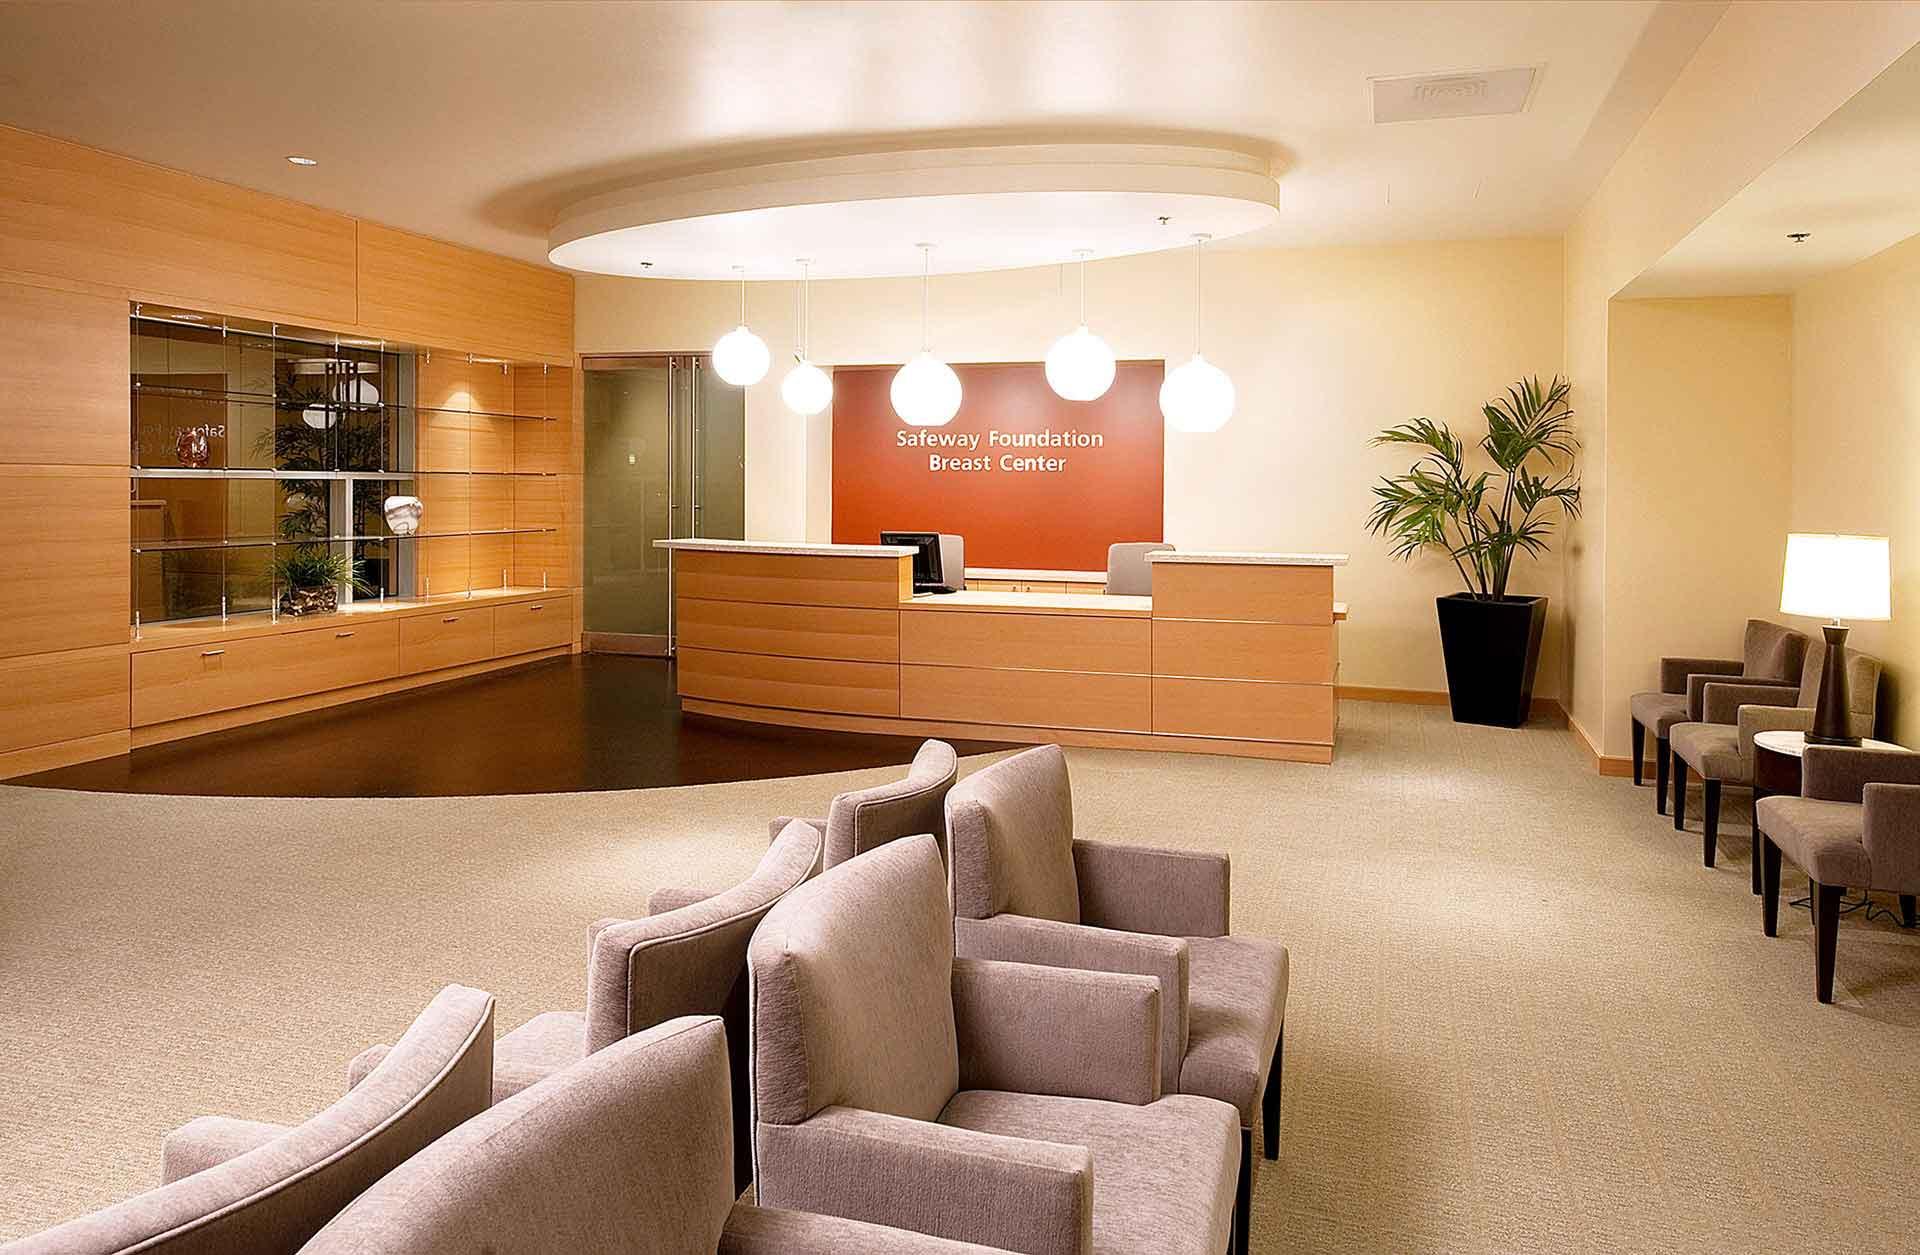 hospital-lobby-front-desk_w